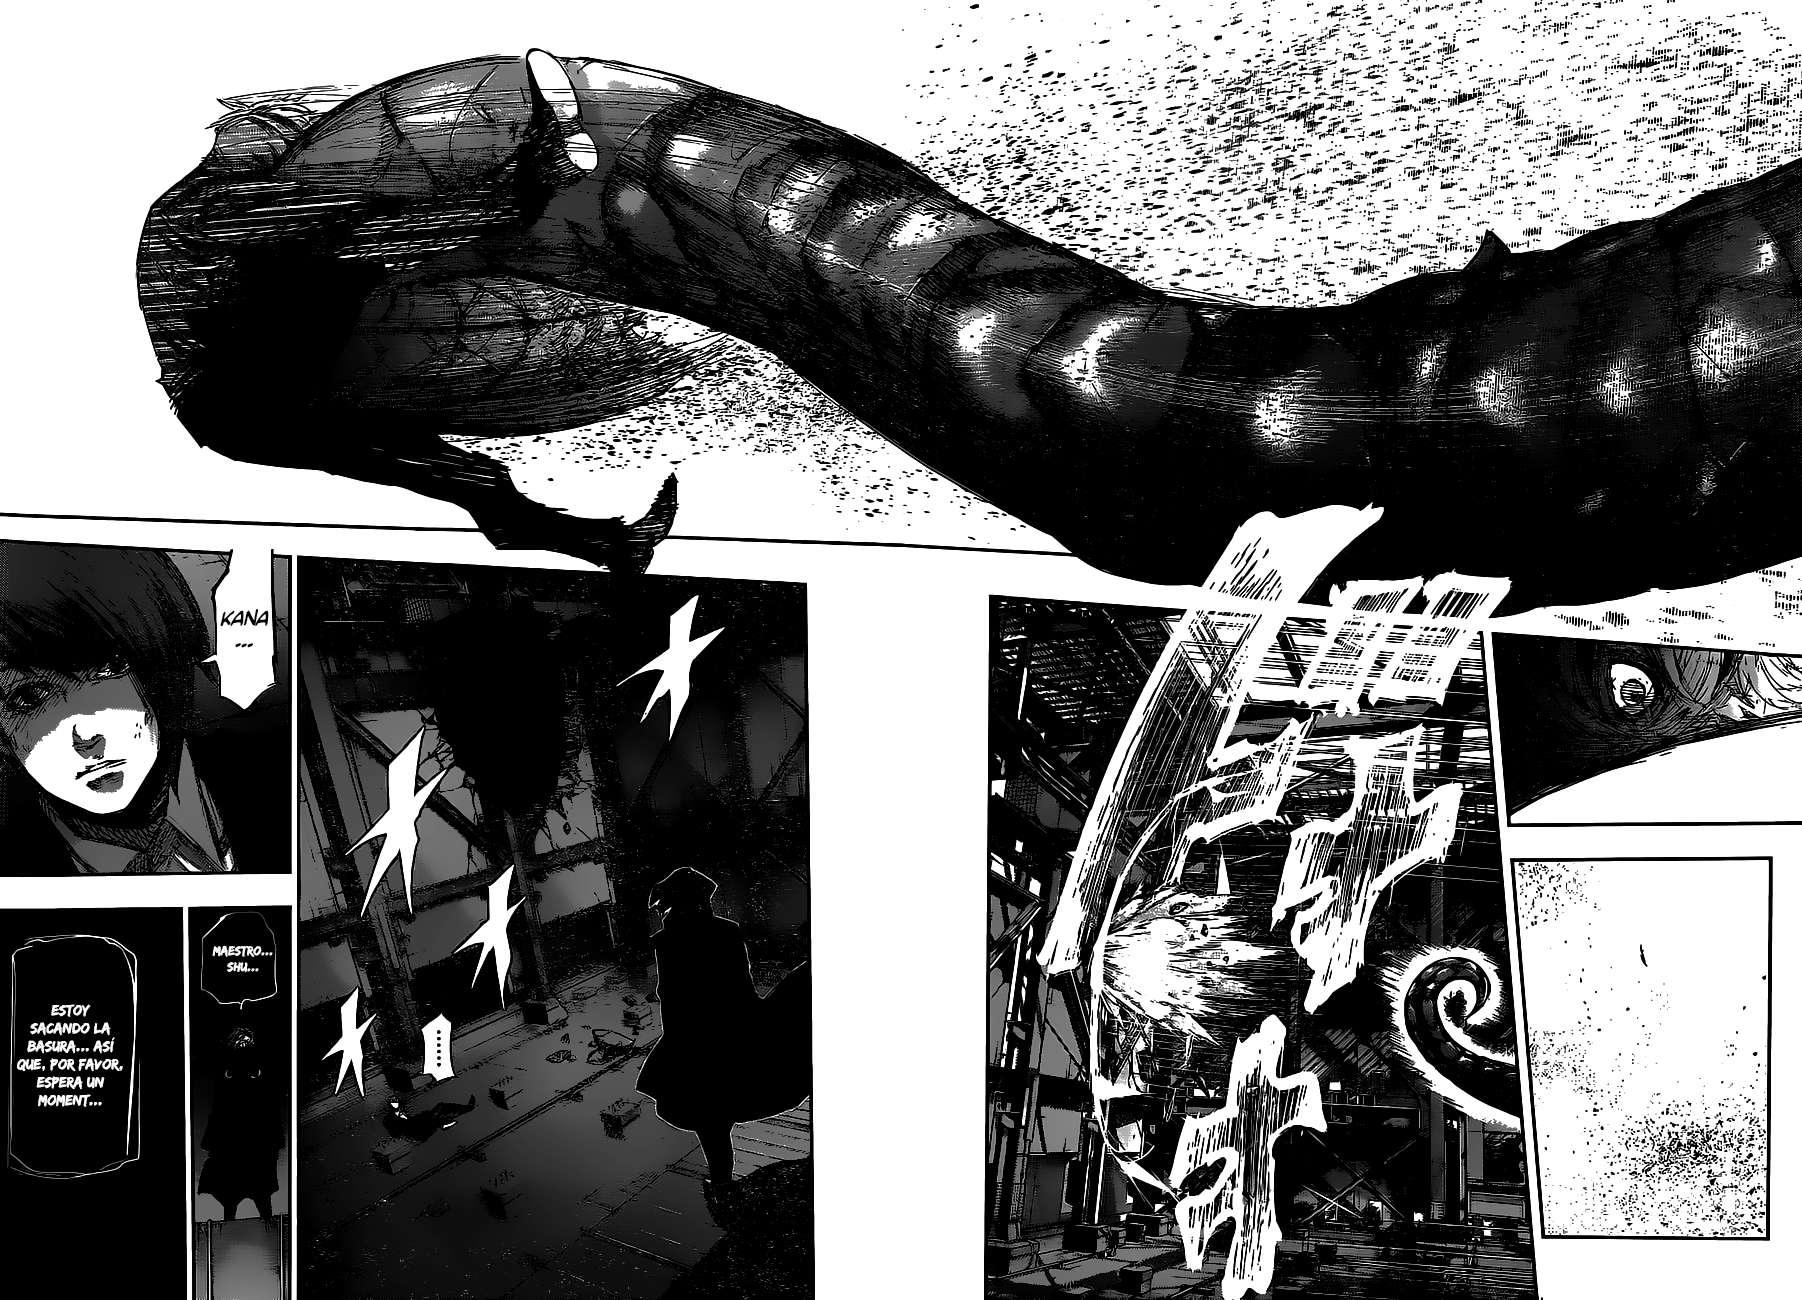 https://c5.ninemanga.com/es_manga/59/59/424182/4198f9d67624156e01306d74490fff41.jpg Page 6